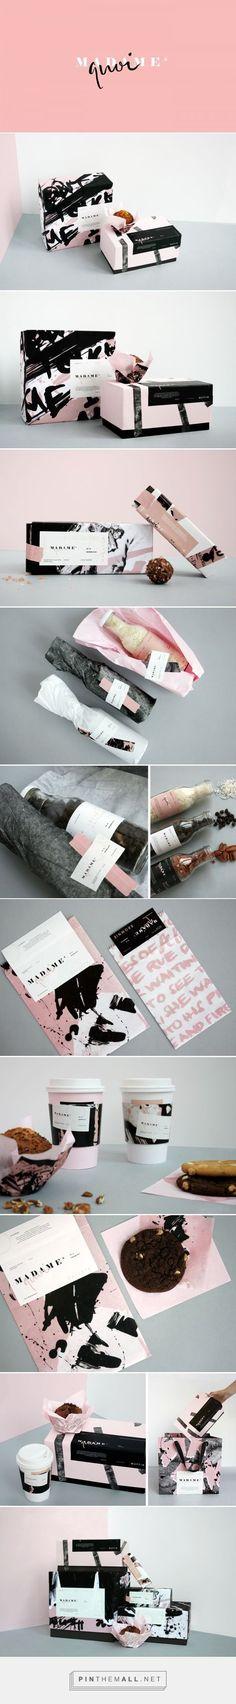 colores + concepto + forma de embalar con papel cebolla a tono + logo